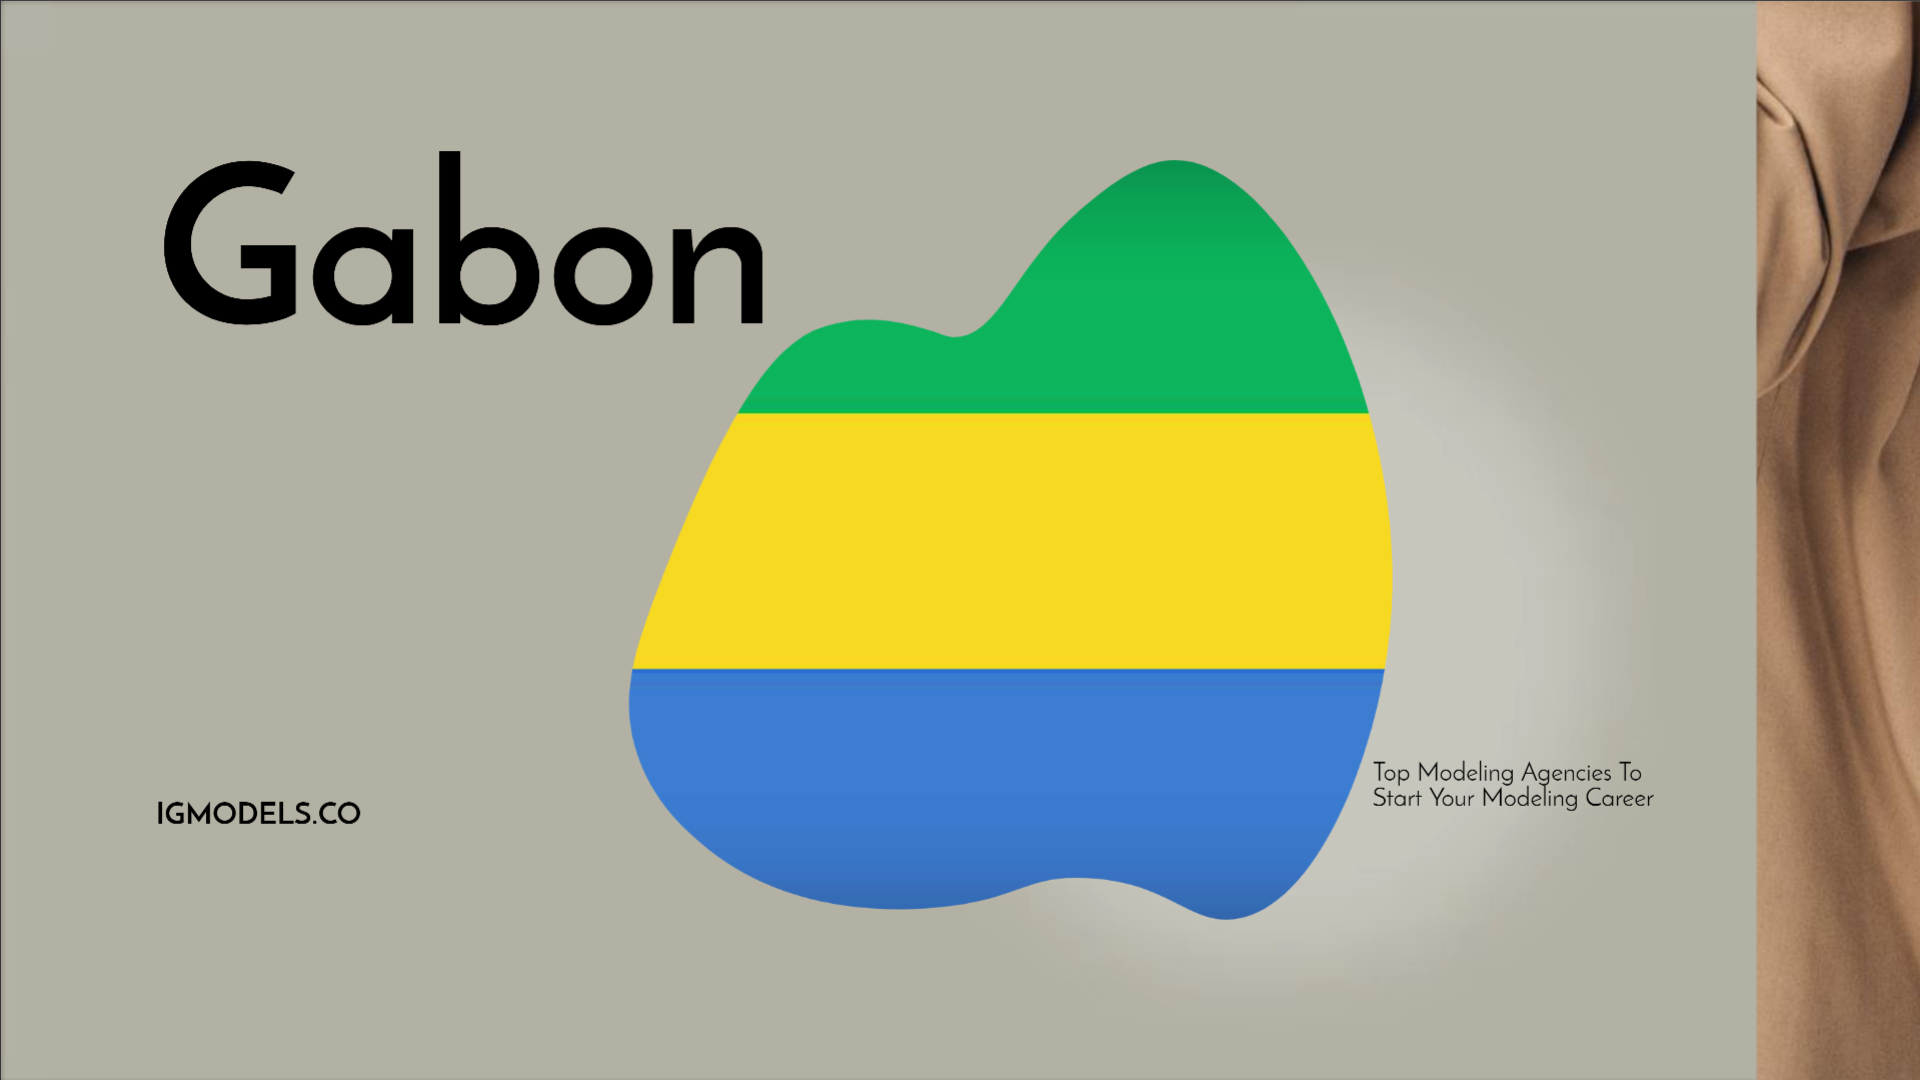 List : Top 32 Modeling Agencies In Gabon To Start Your Modeling Career In 2021